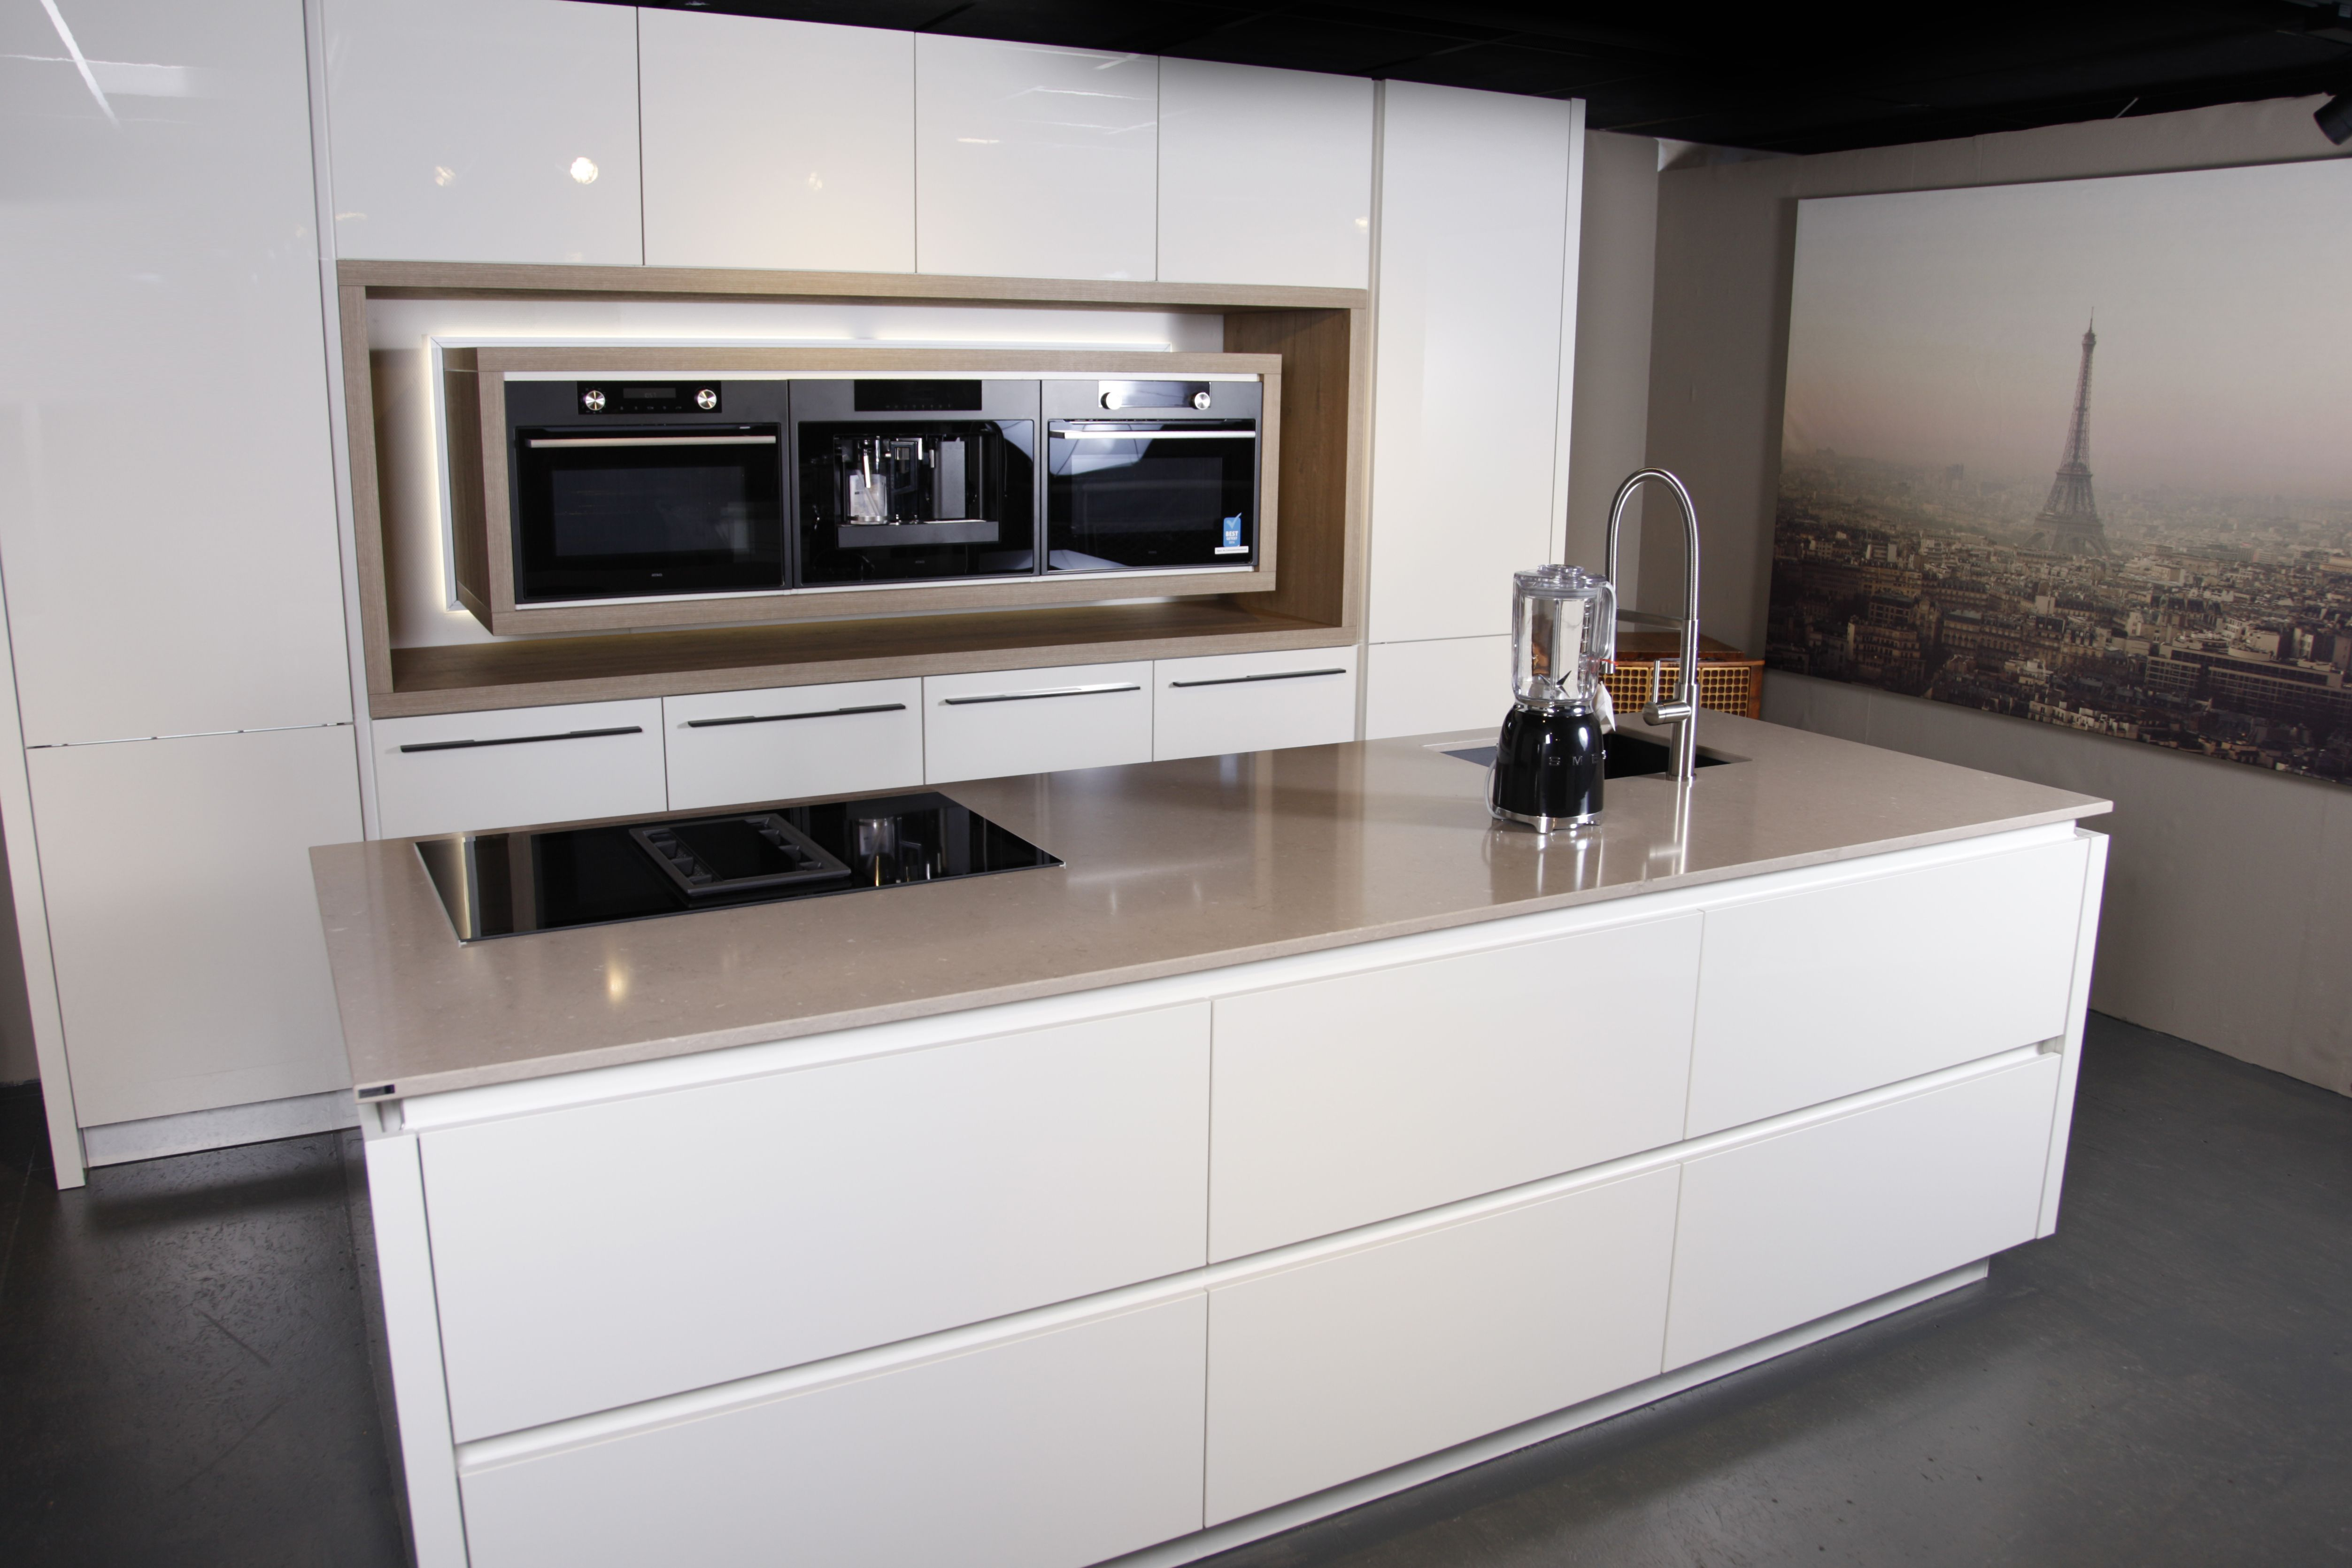 Moderne hoogglans greeploze keuken. met dun composiet werkblad en